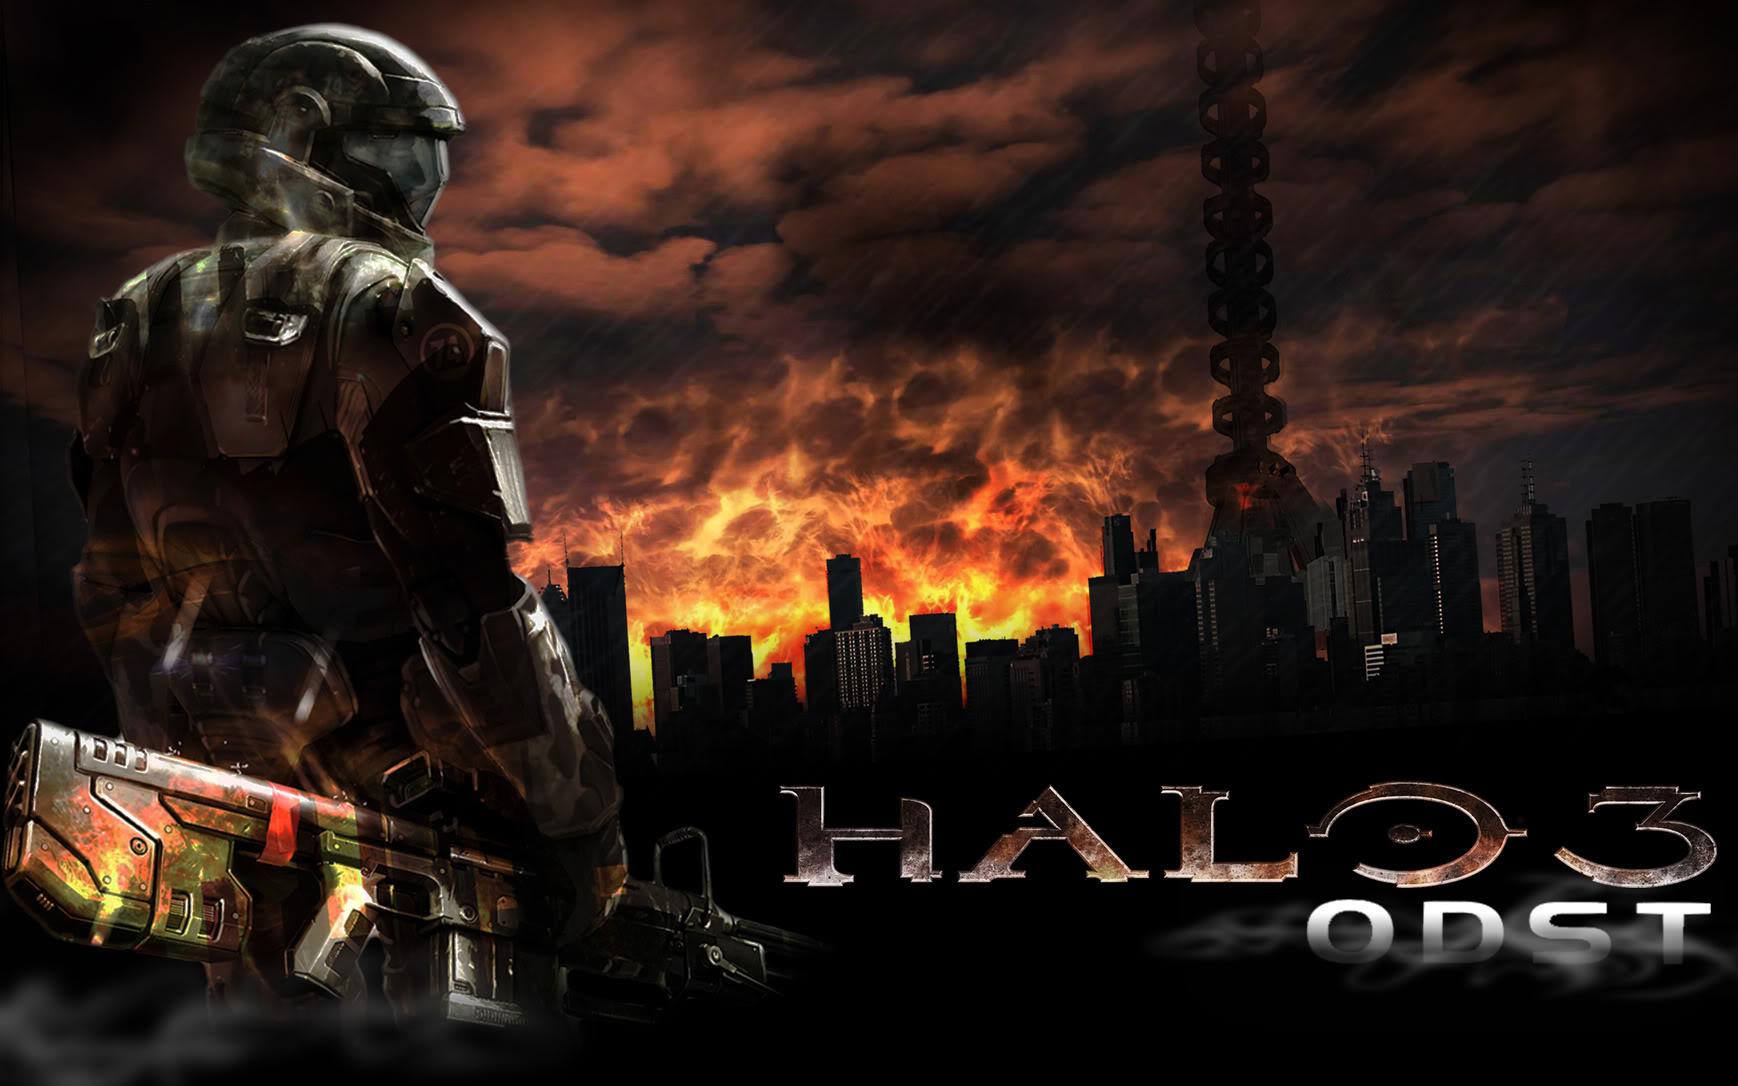 48 Halo 3 Background On Wallpapersafari